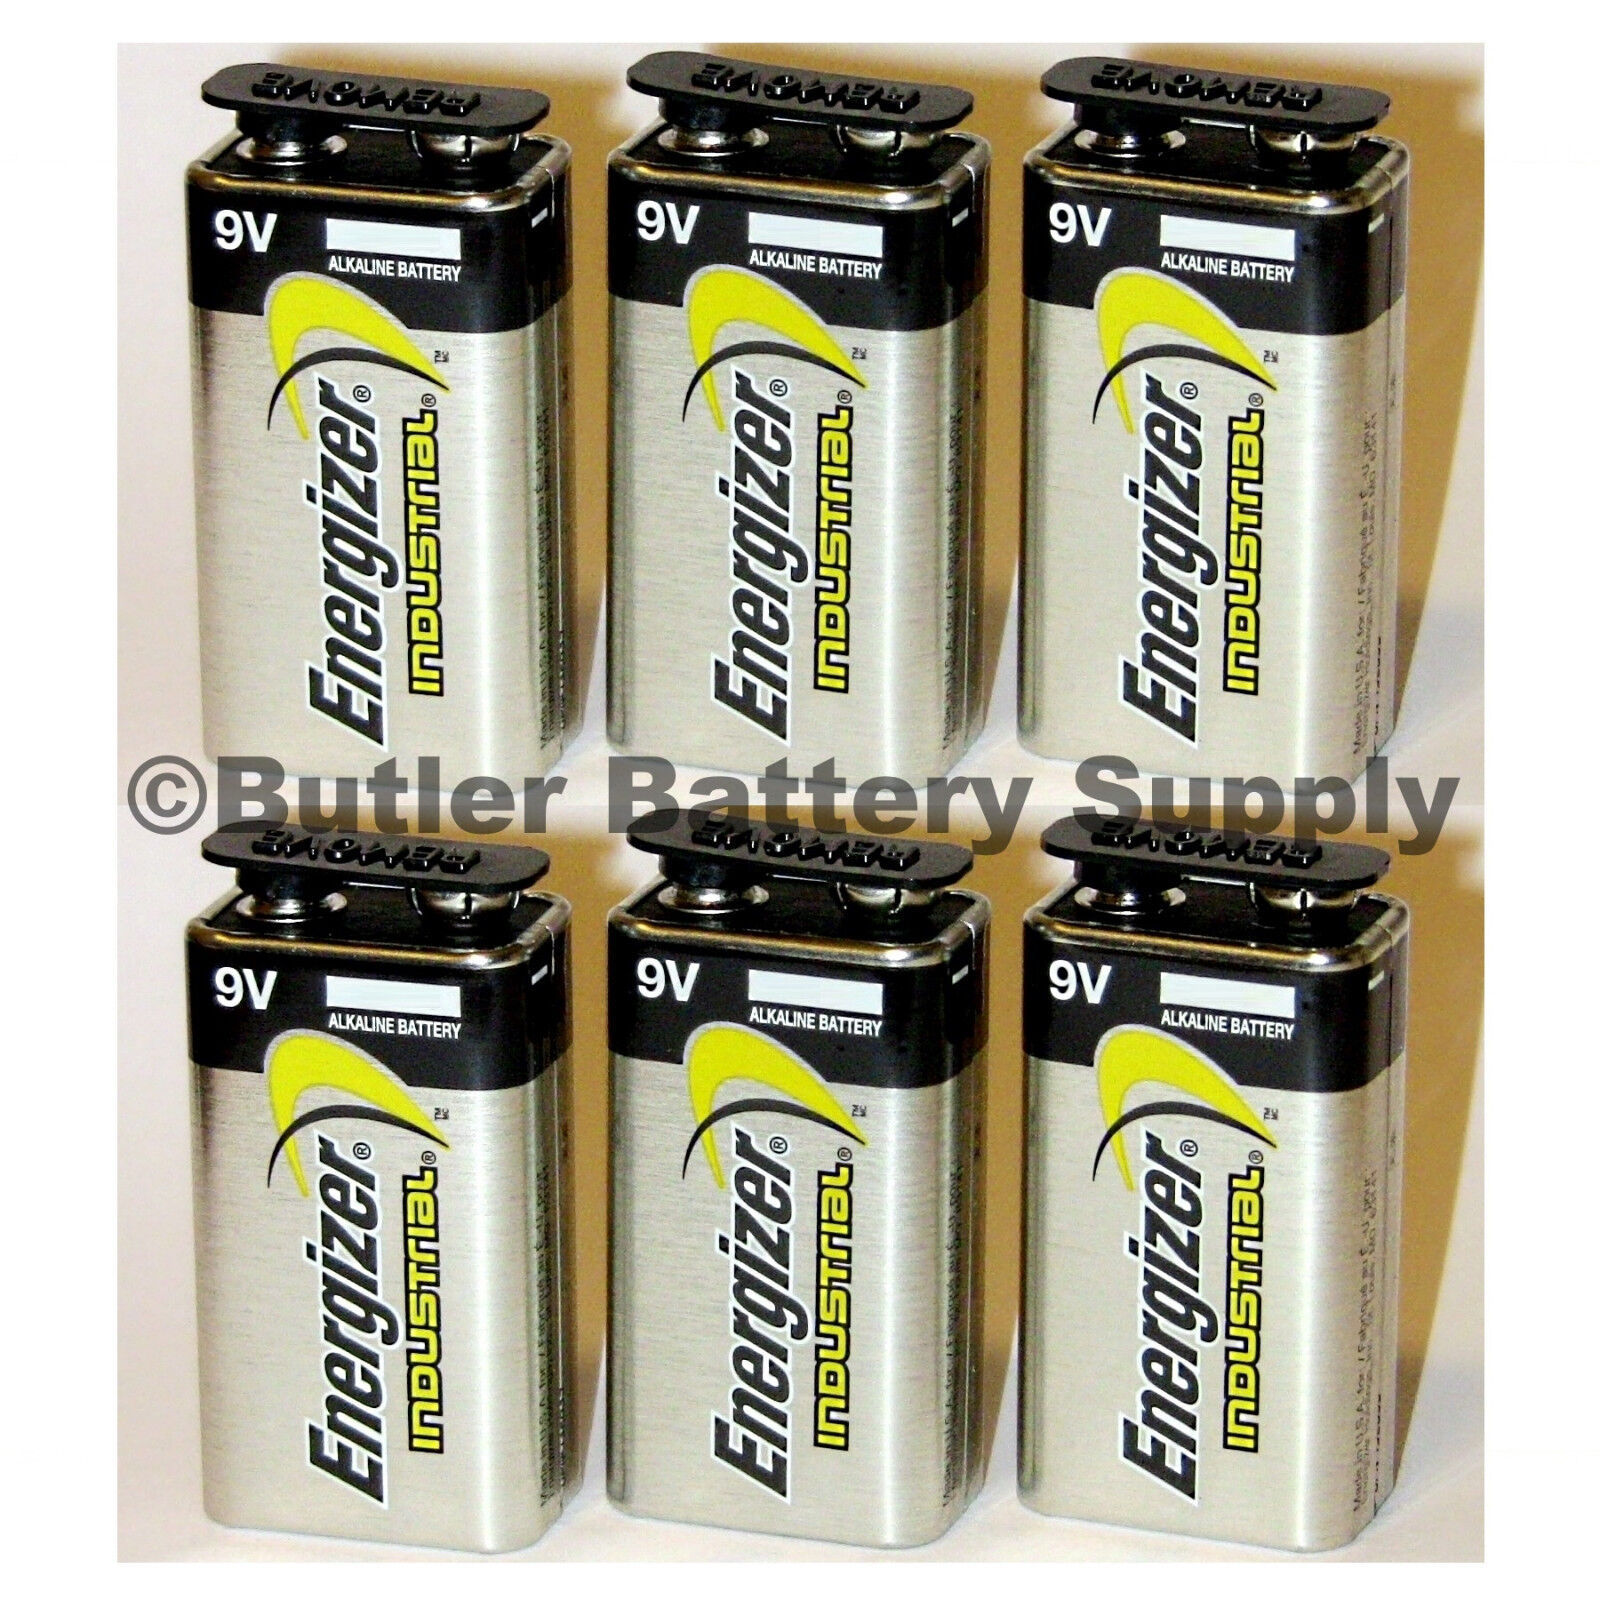 6 Energizer Industrial 9 Volt  Alkaline Batteries